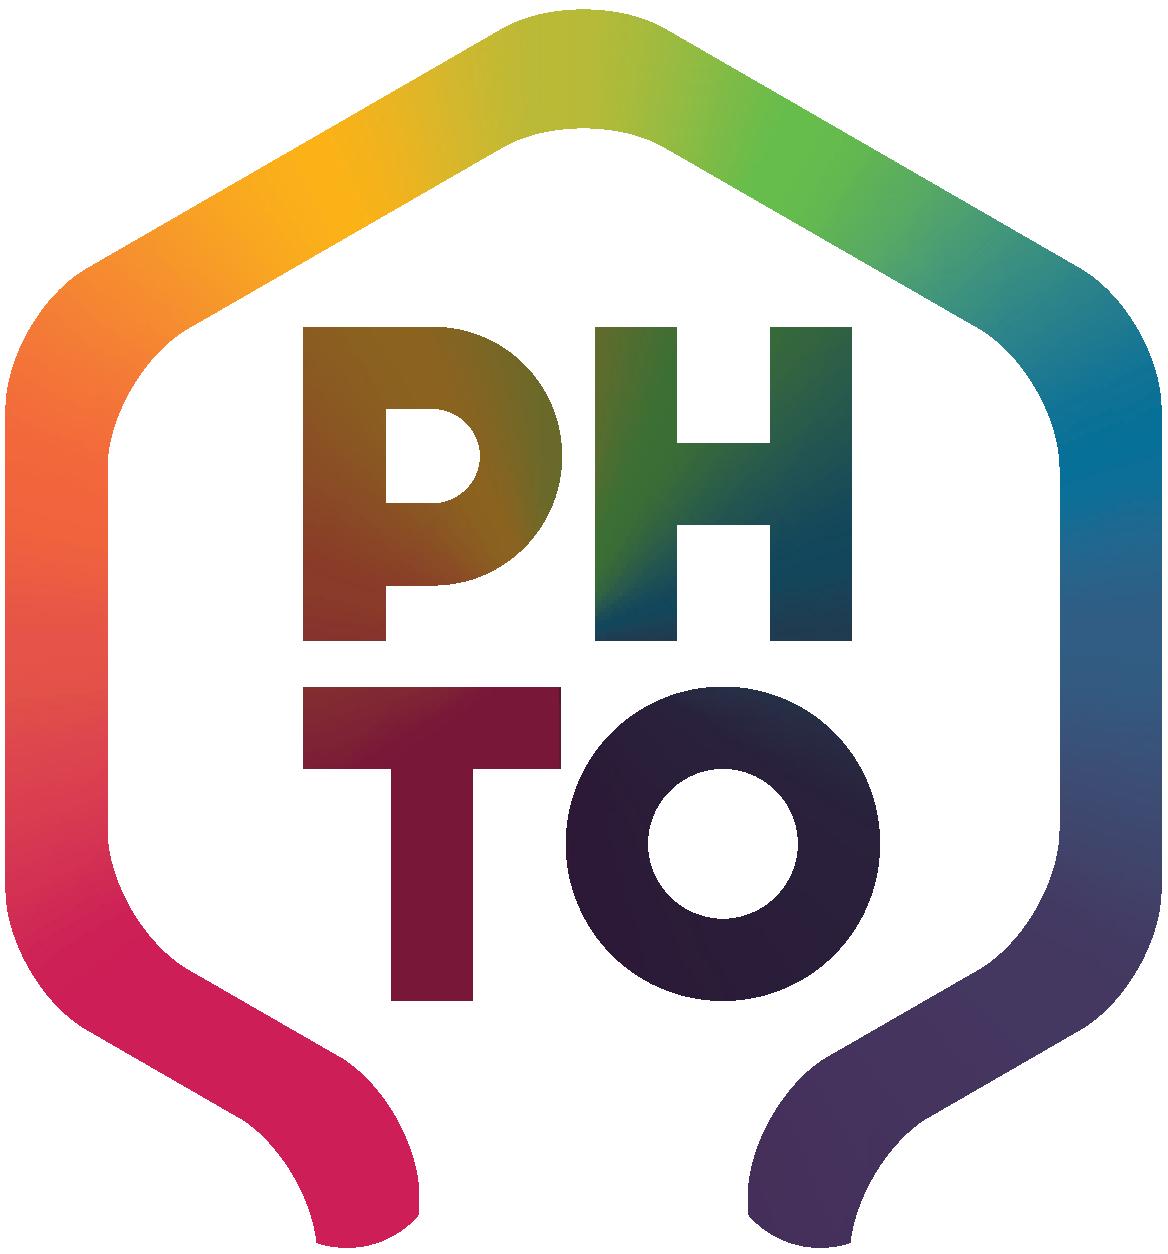 PHTO-Square-Rainbow1400x1400.png